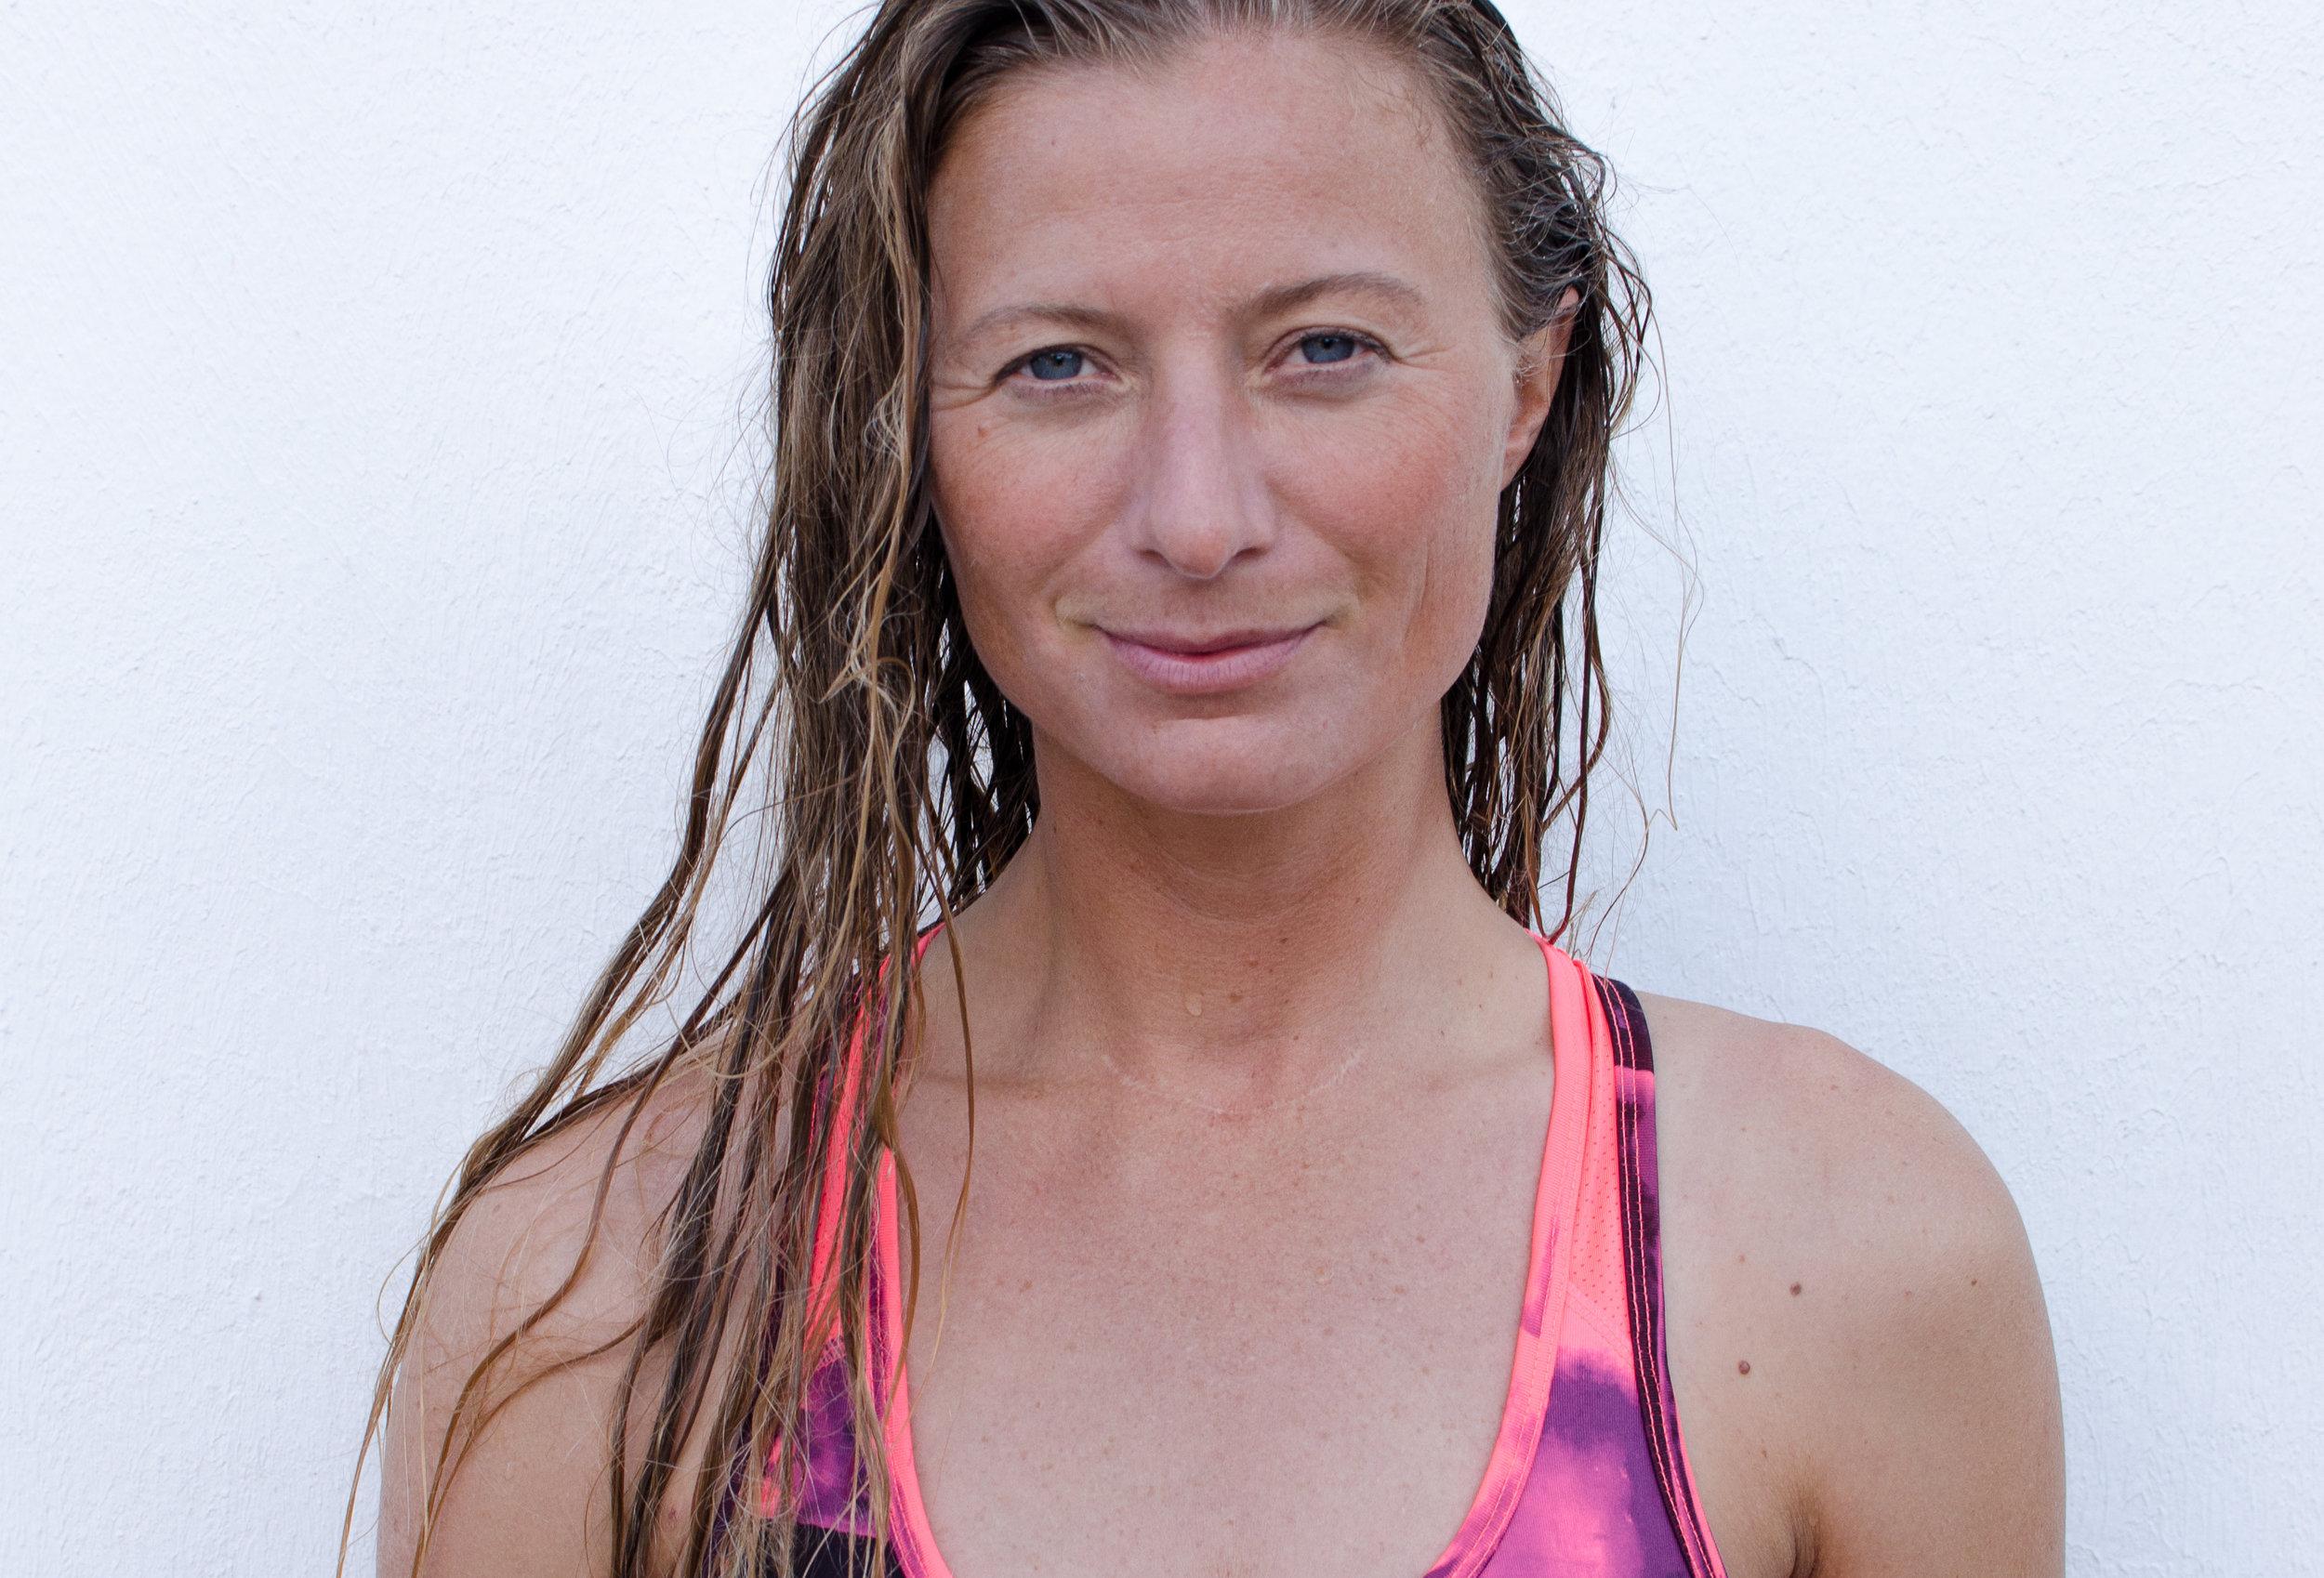 Annette Qvistgaard - Nordjydsk Windsurfing Klub (Aalborg)SUP Surfing